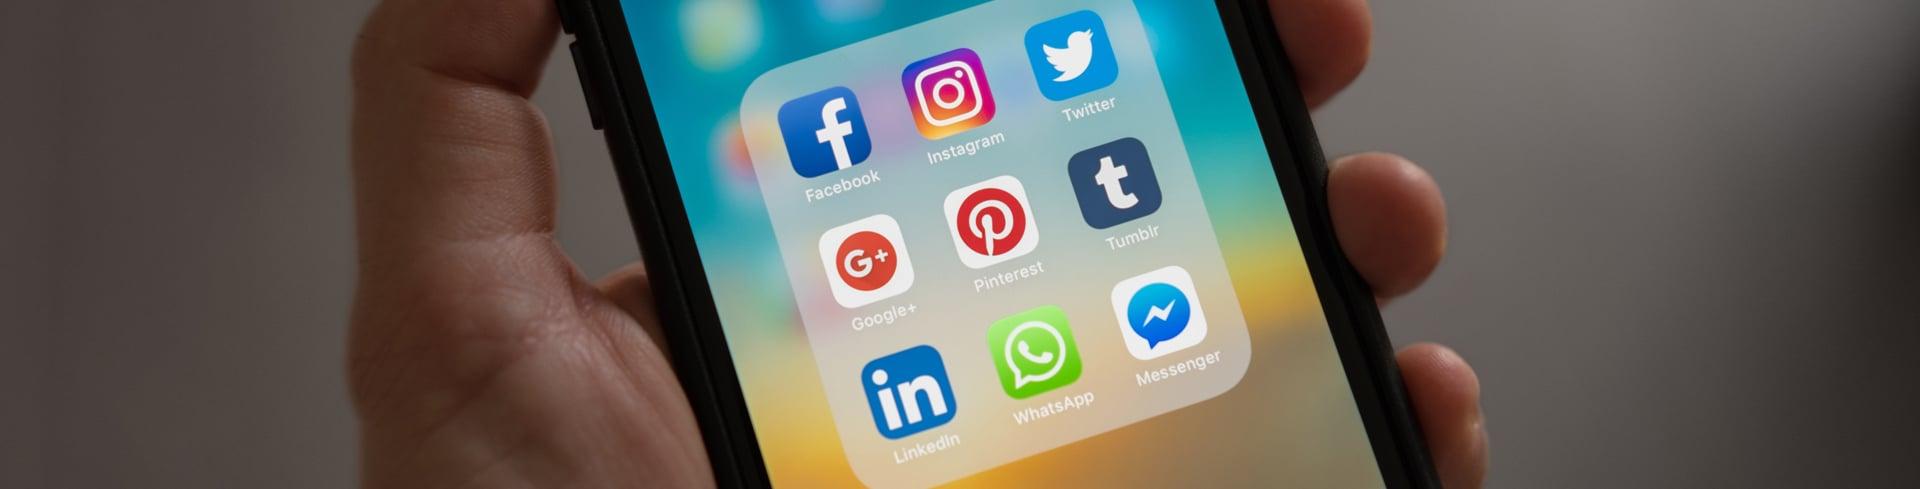 14 fabelhafte Fakten über Social Media